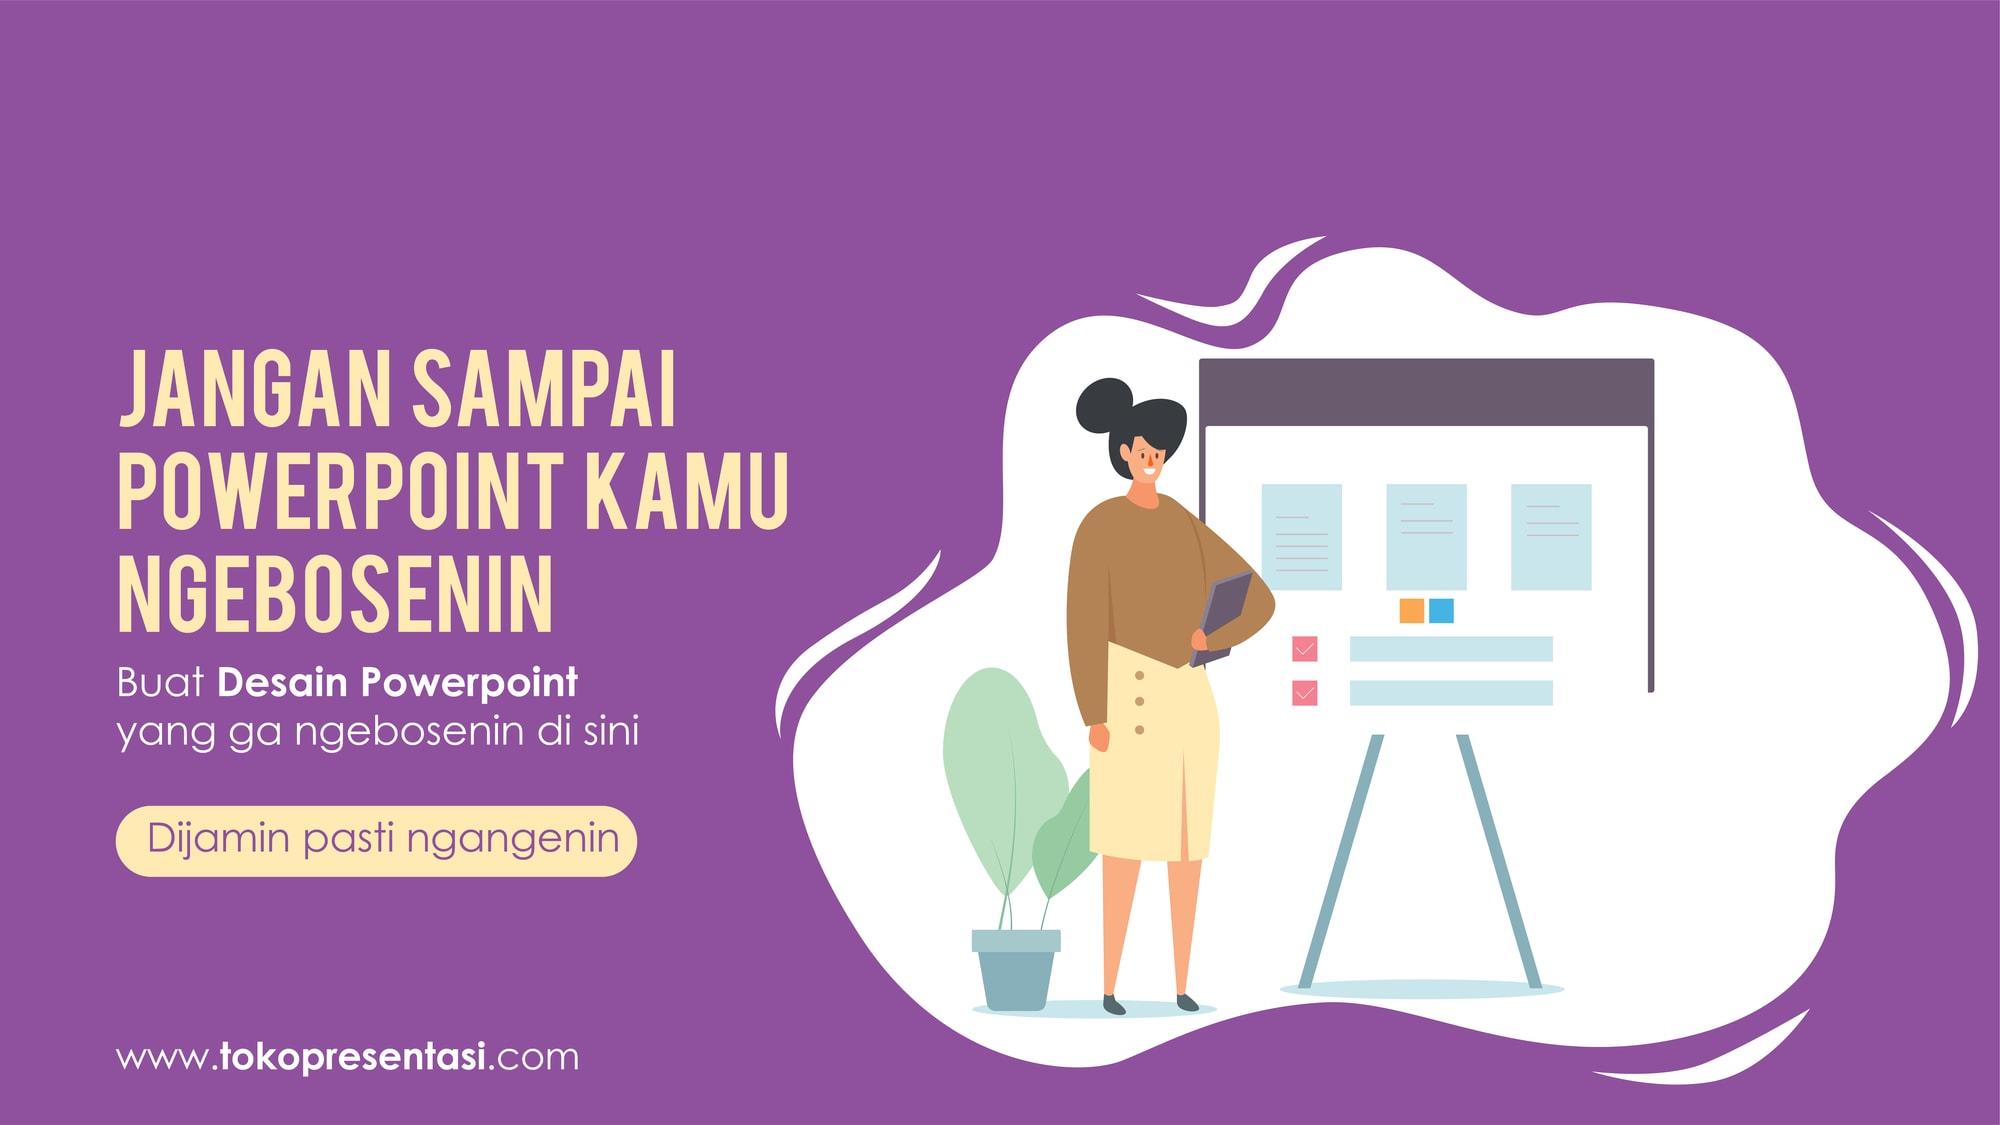 Jasa Pembuatan Desain Presentasi Powerpoint Lomba Inovasi GKM WKM TKMPN Pos Indonesia Tokopresentasi